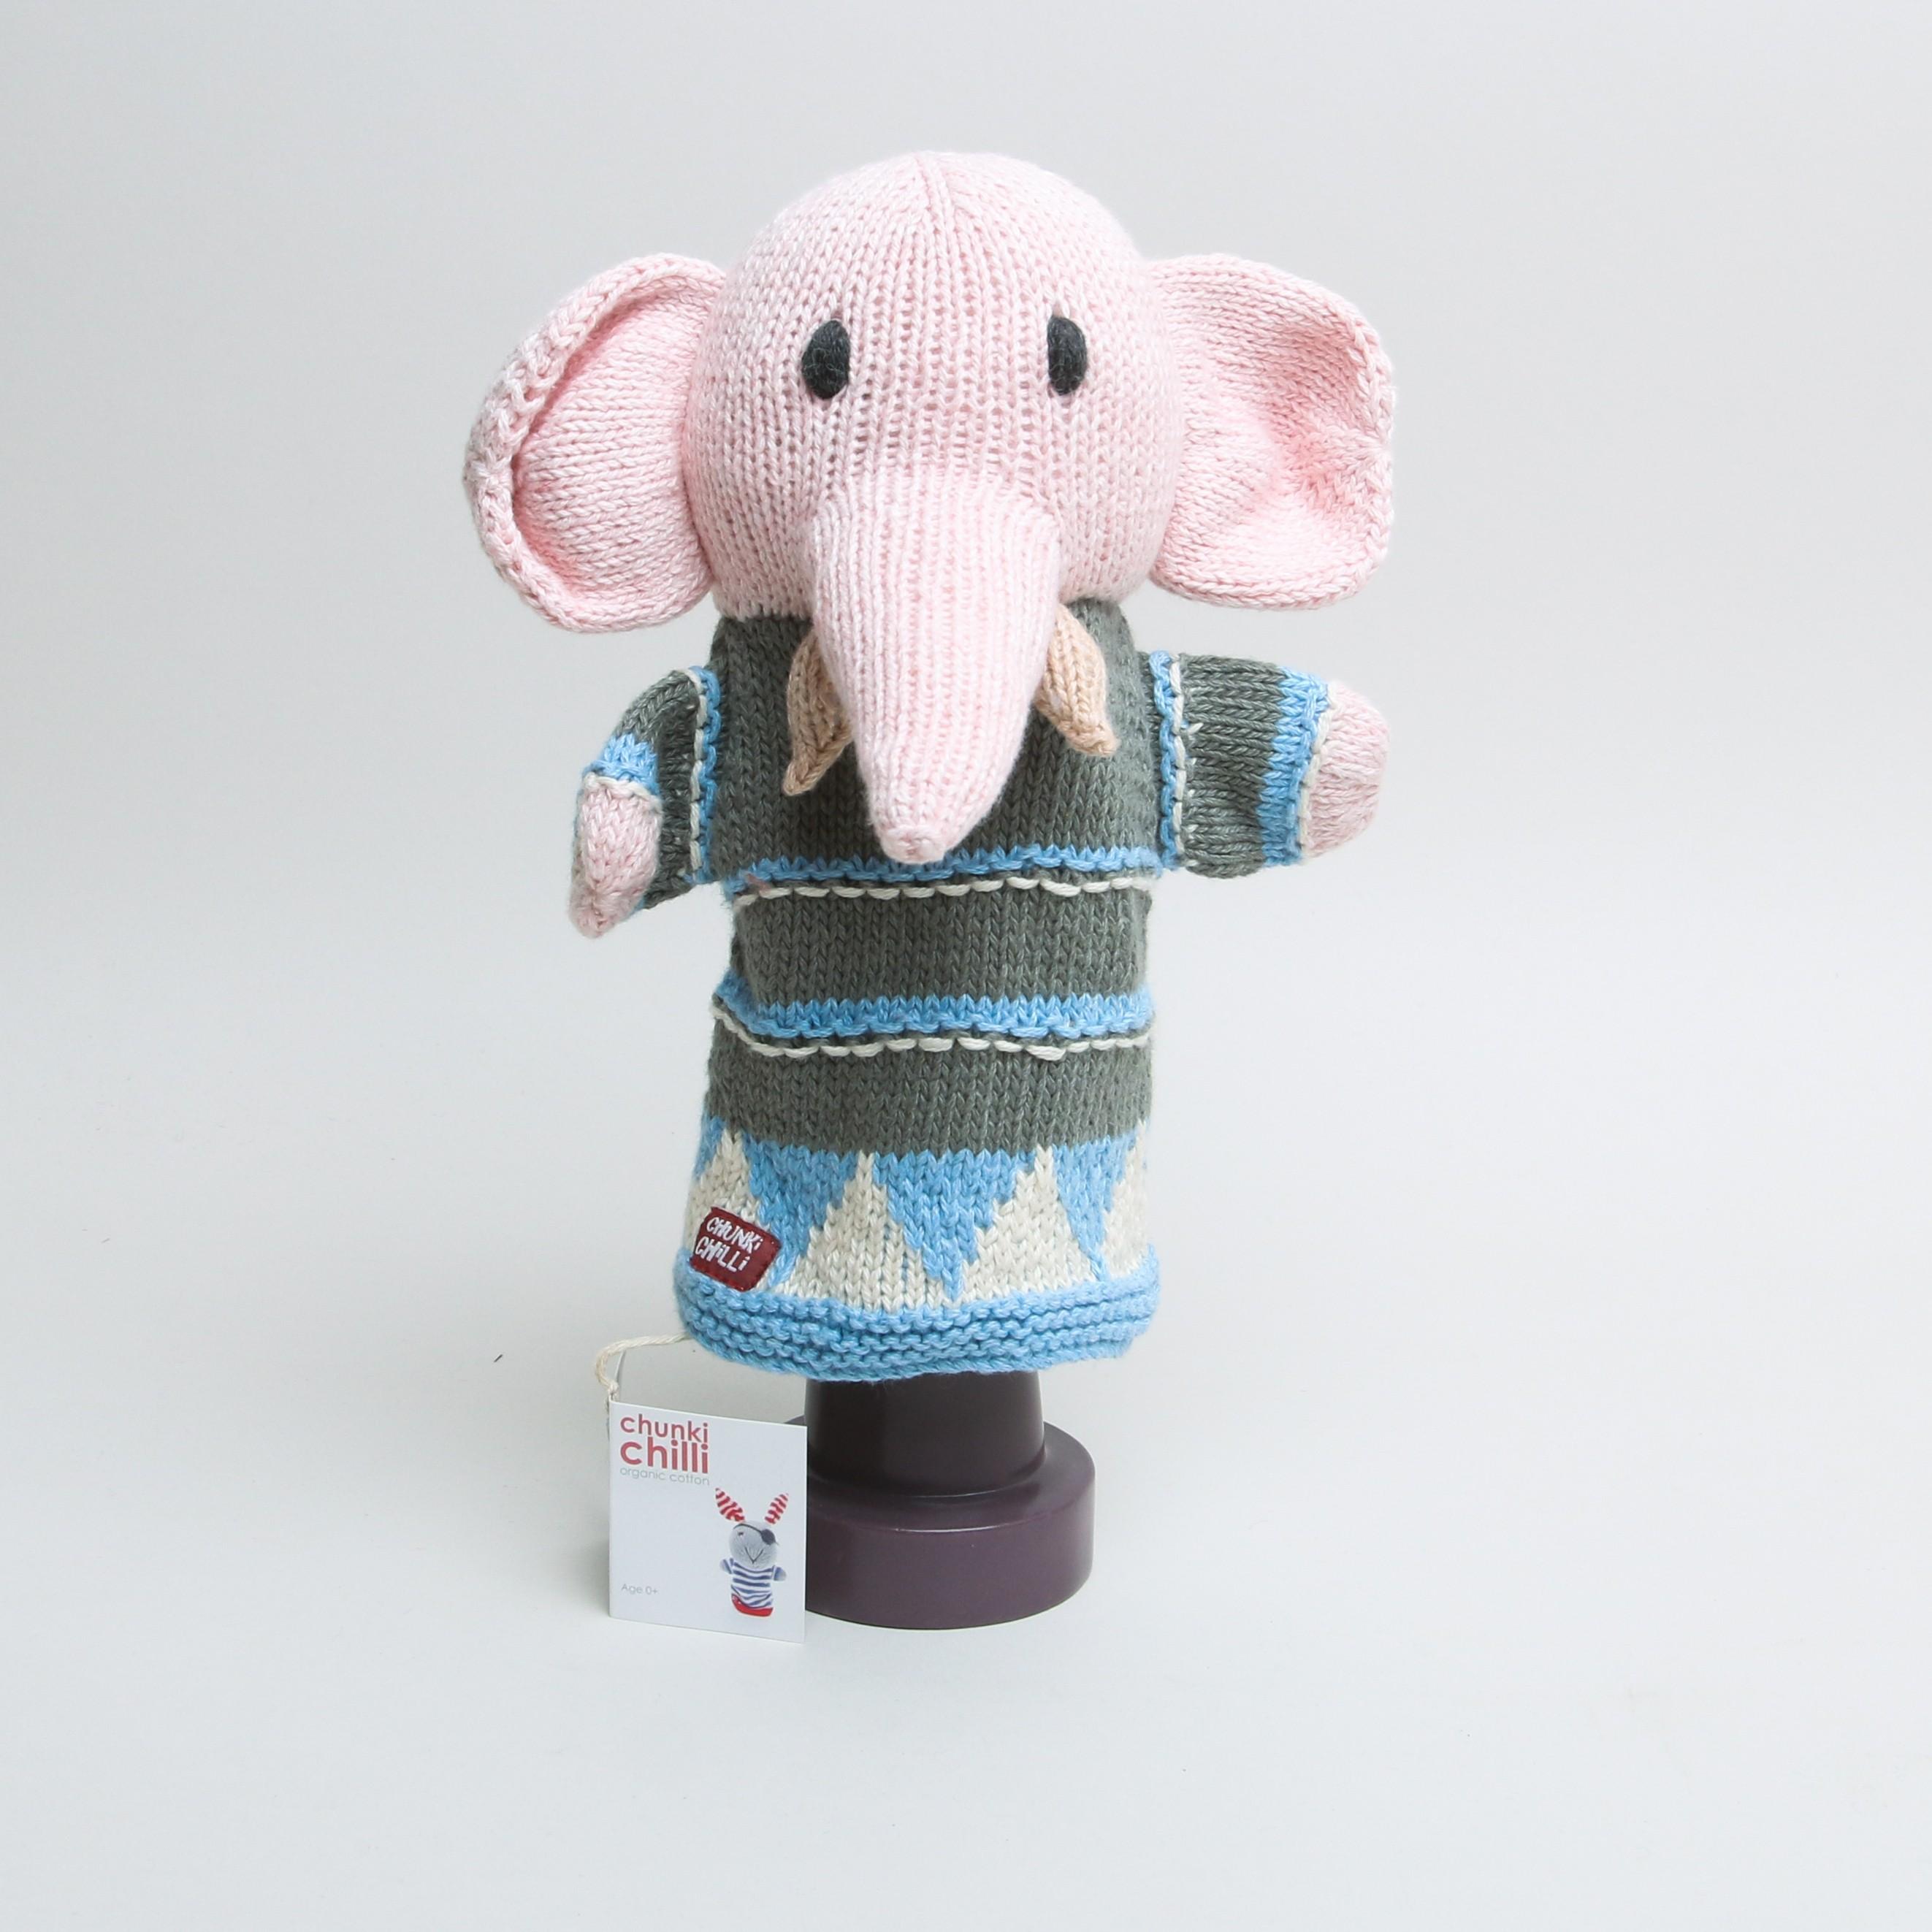 Chunky Chilli Hand Puppet Elephant